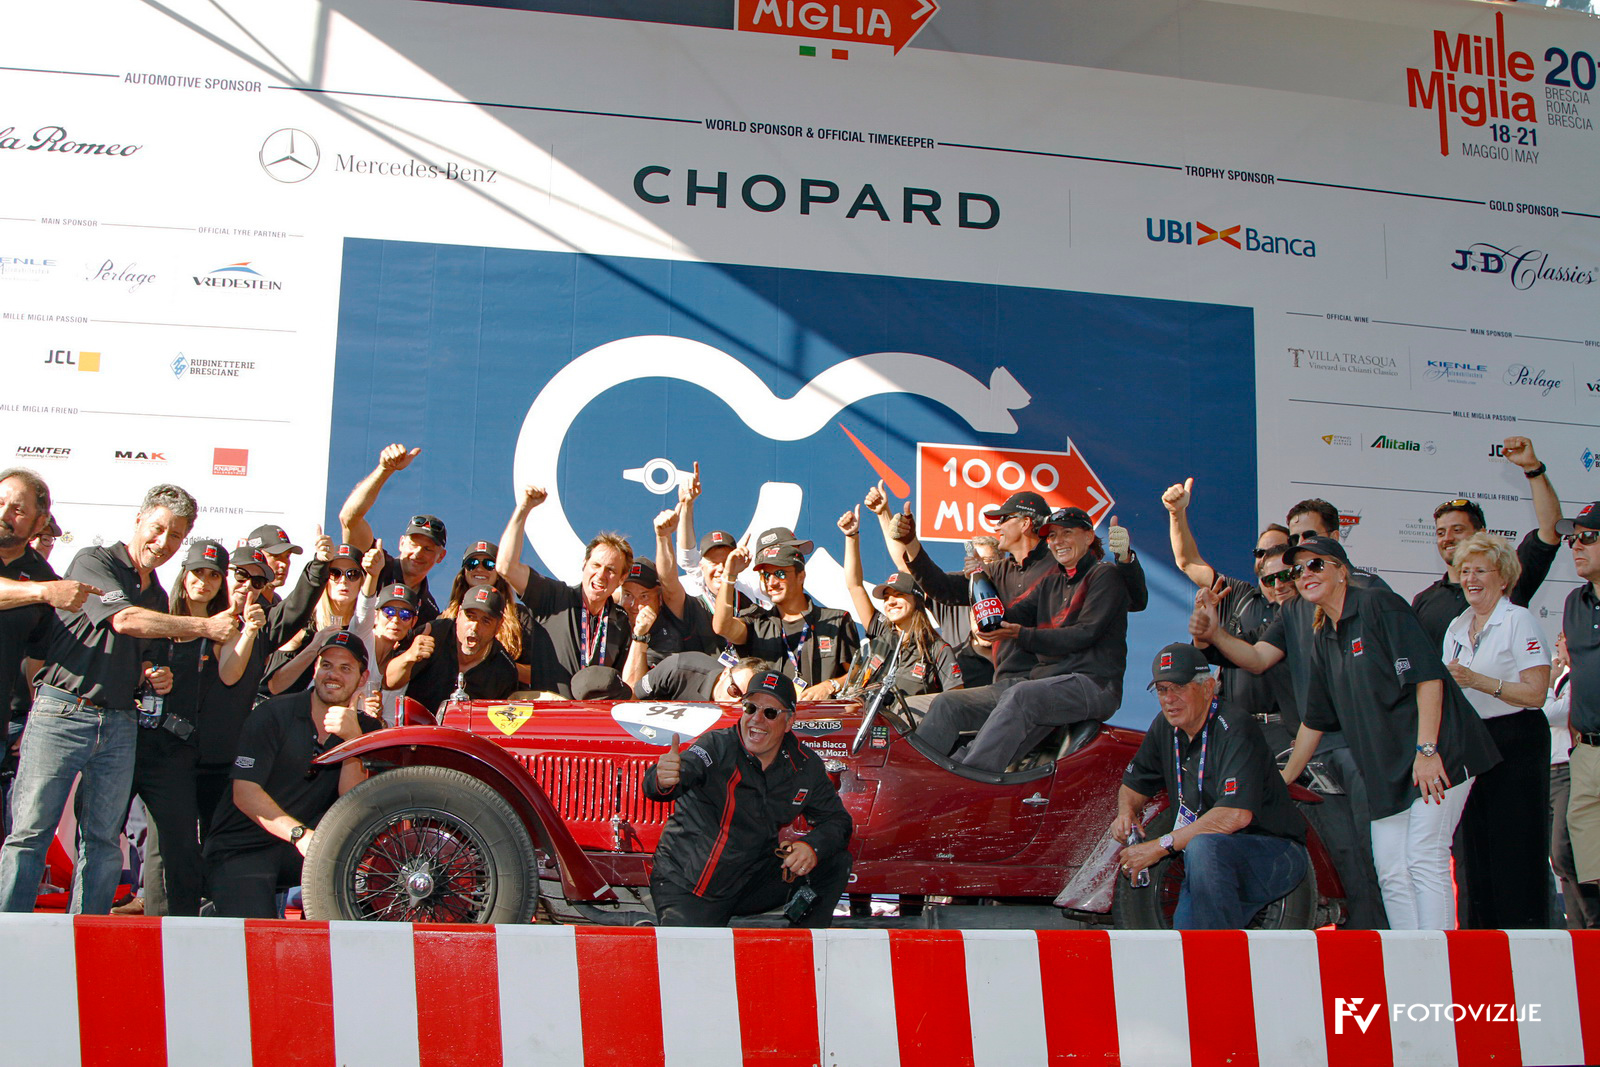 V cilju dirke Mille Miglia 2017